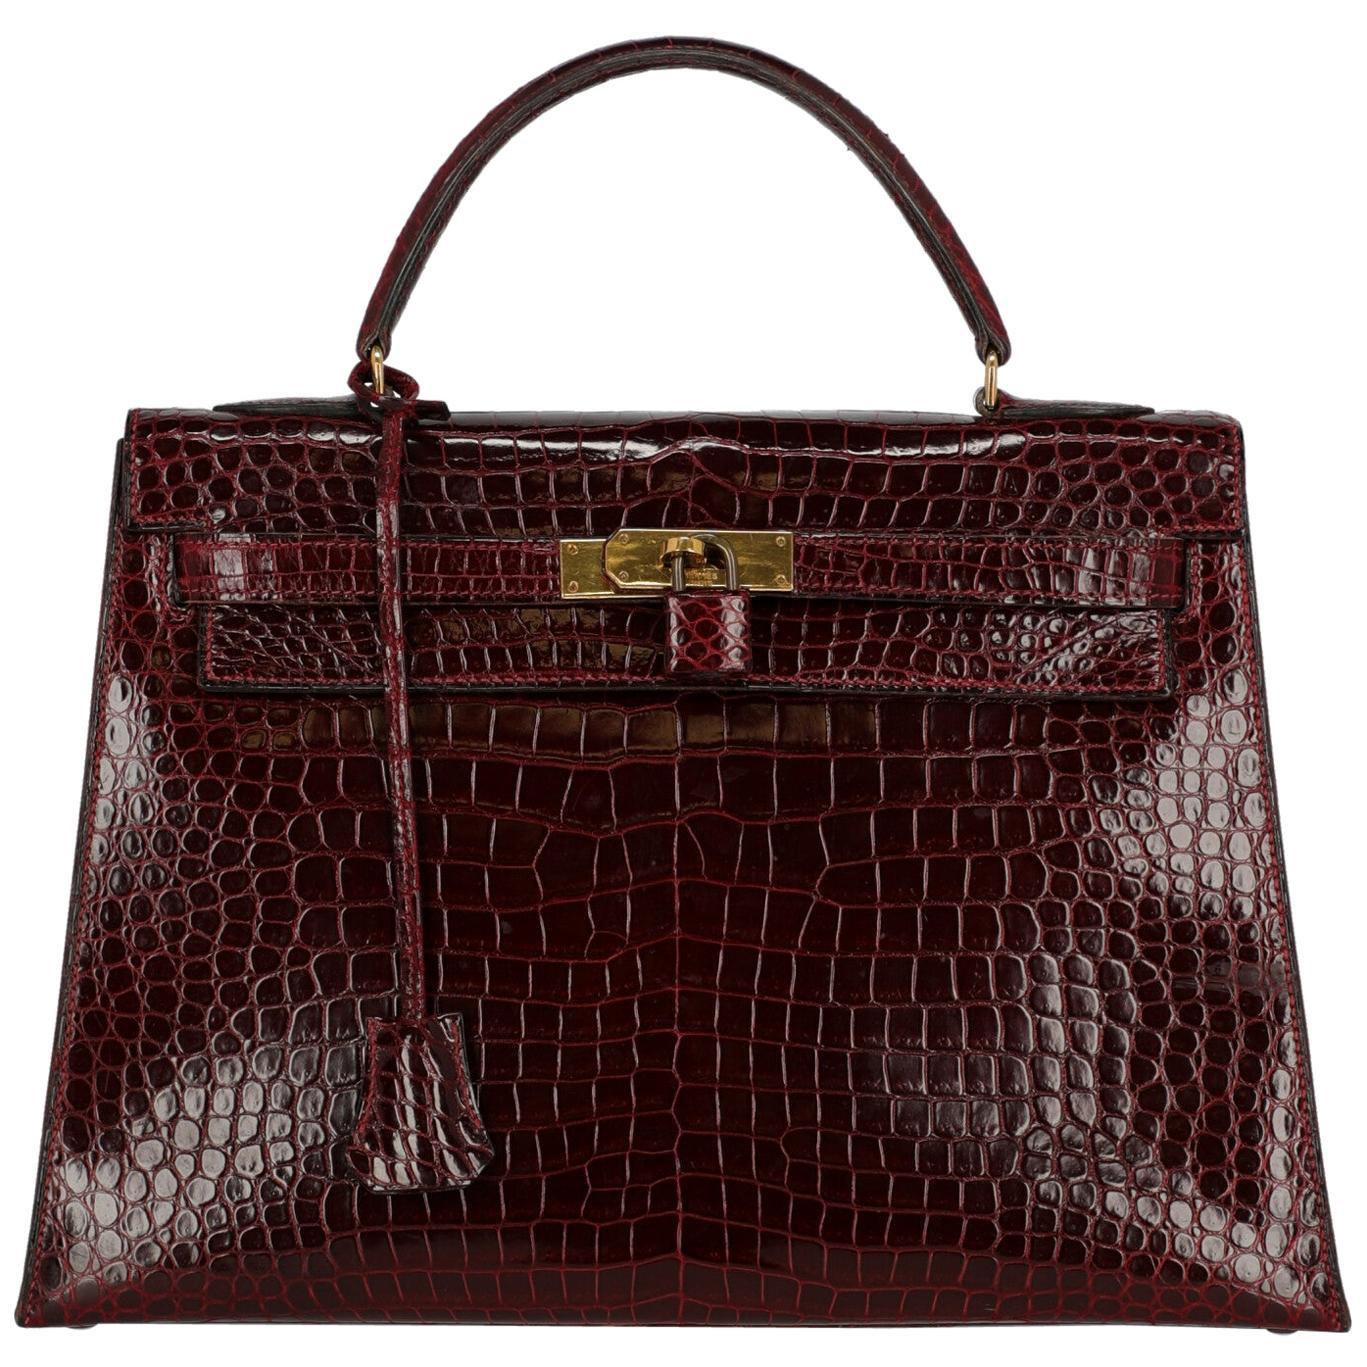 Hermès Women's Handbag Kelly32 Burgundy Leather